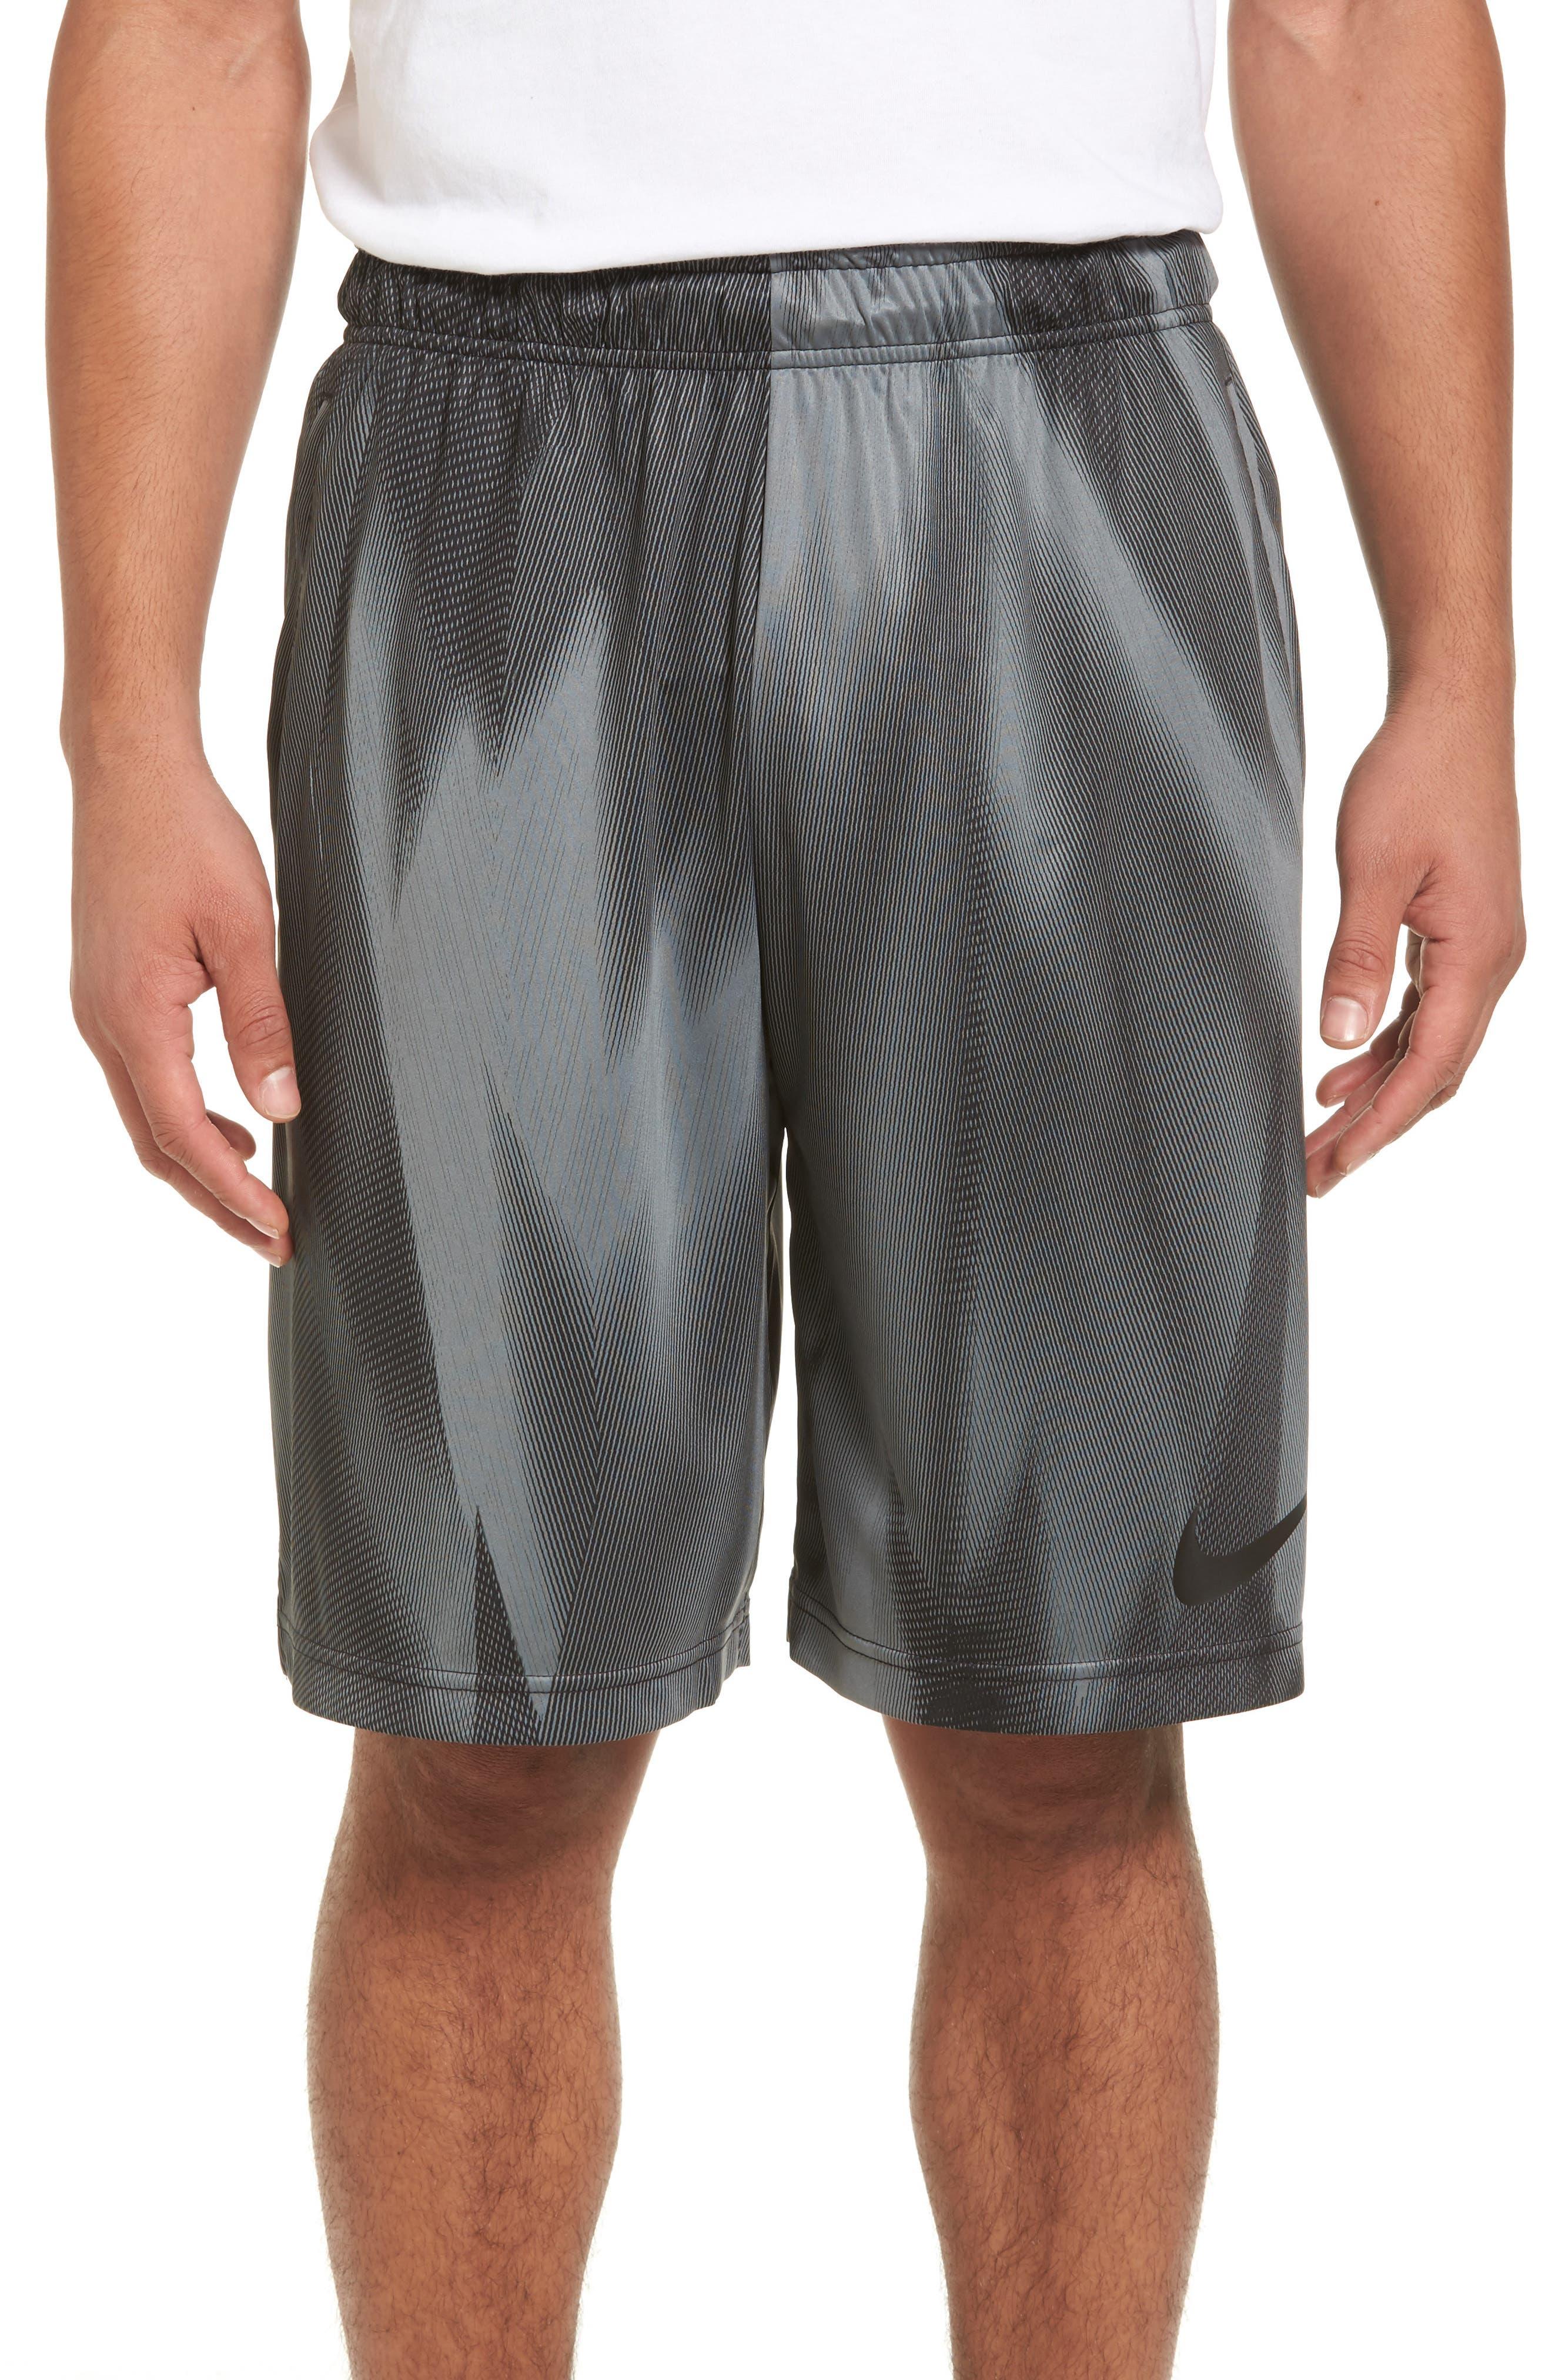 Dry Training Shorts,                         Main,                         color, Black/ Black